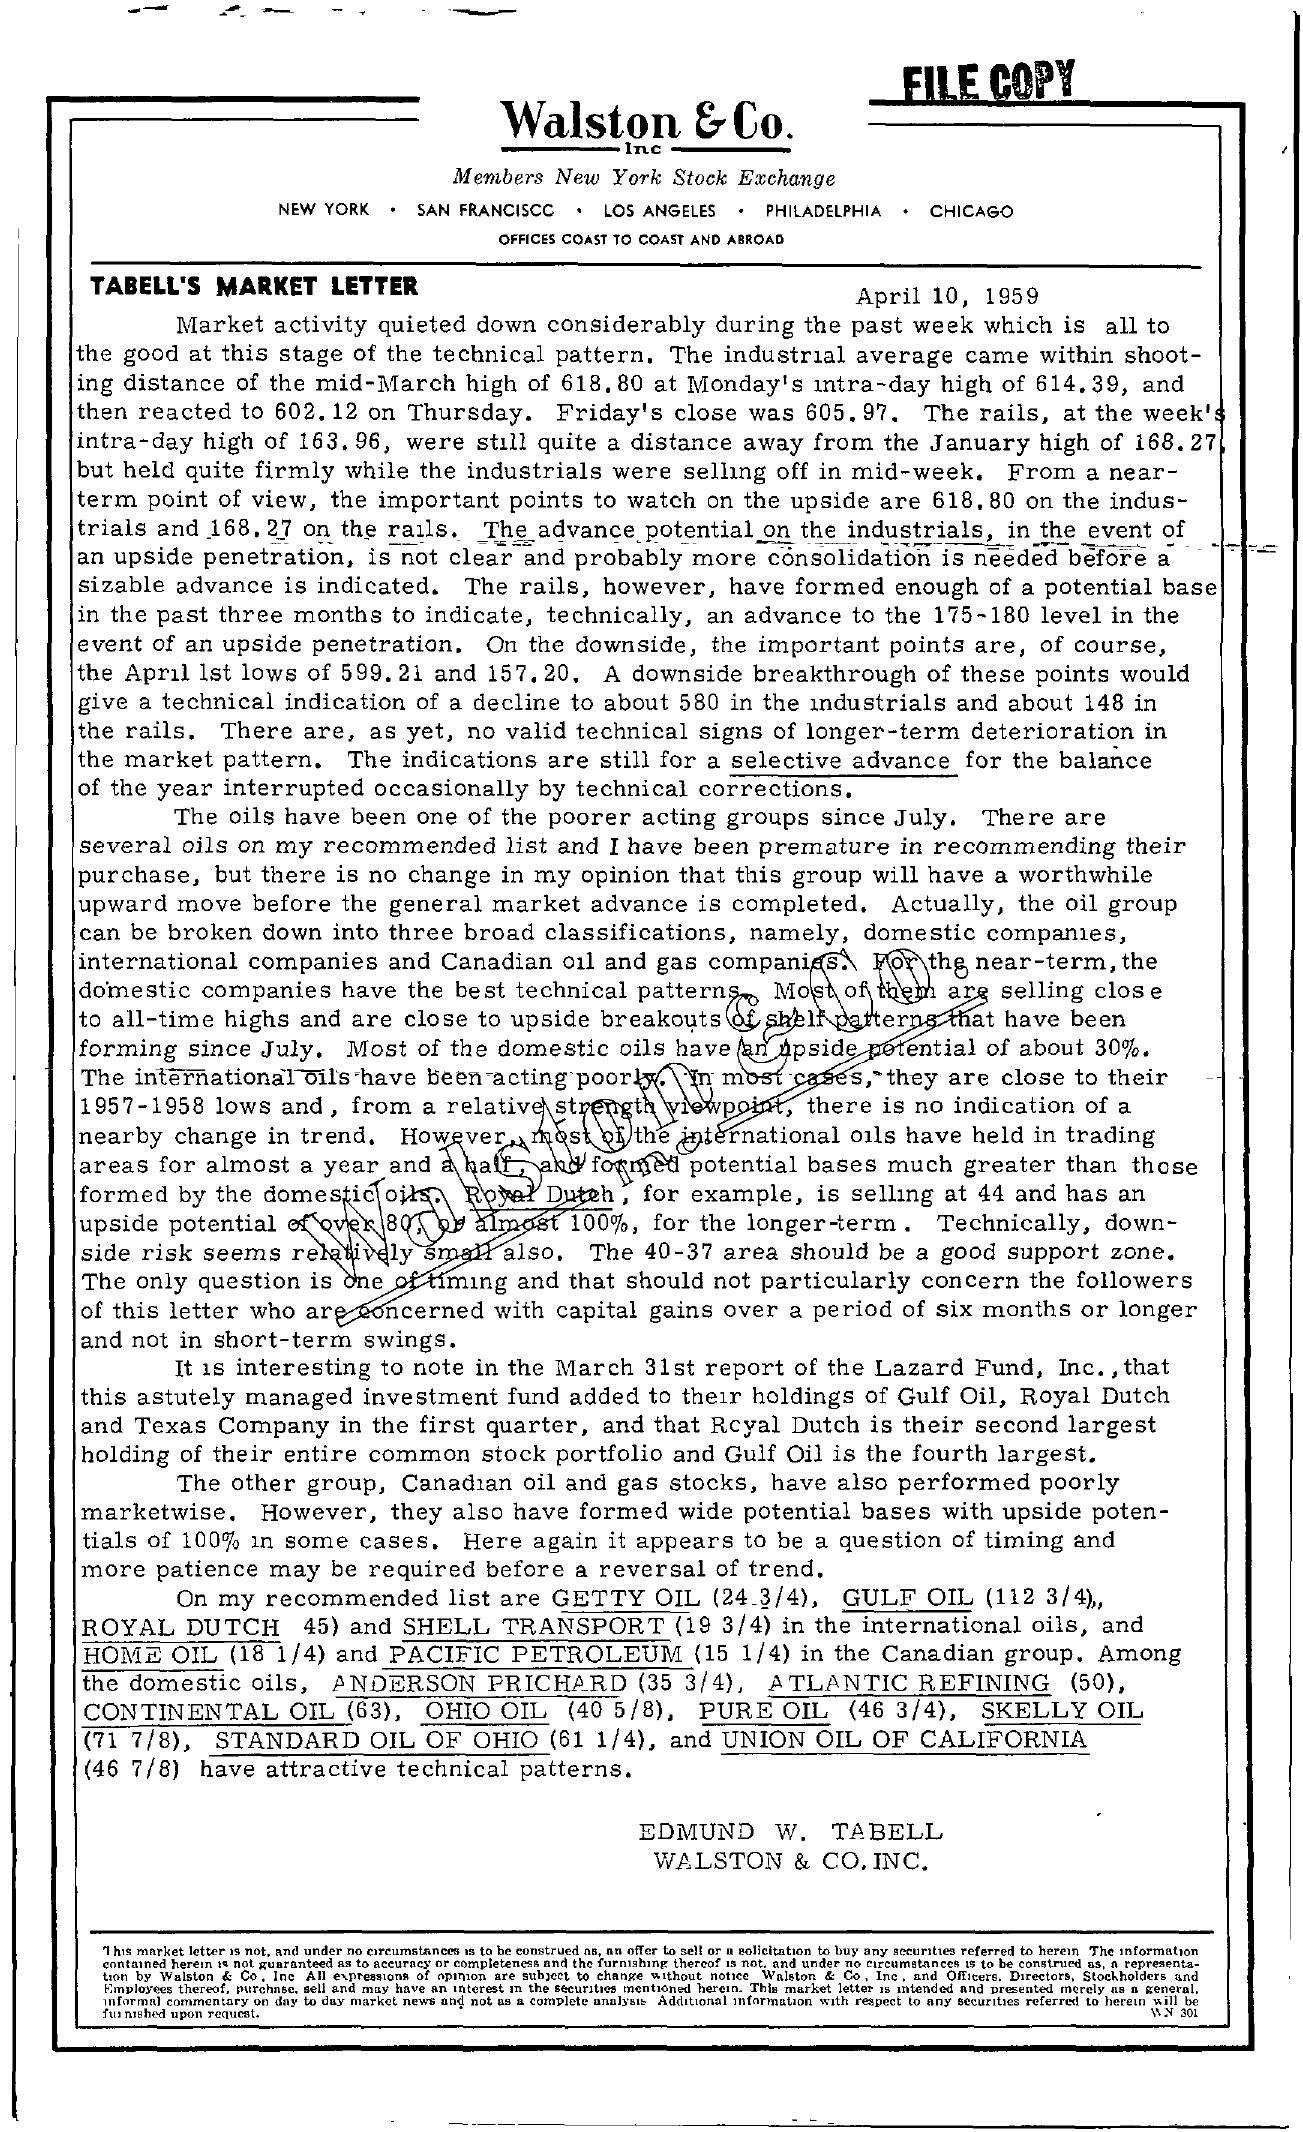 Tabell's Market Letter - April 10, 1959